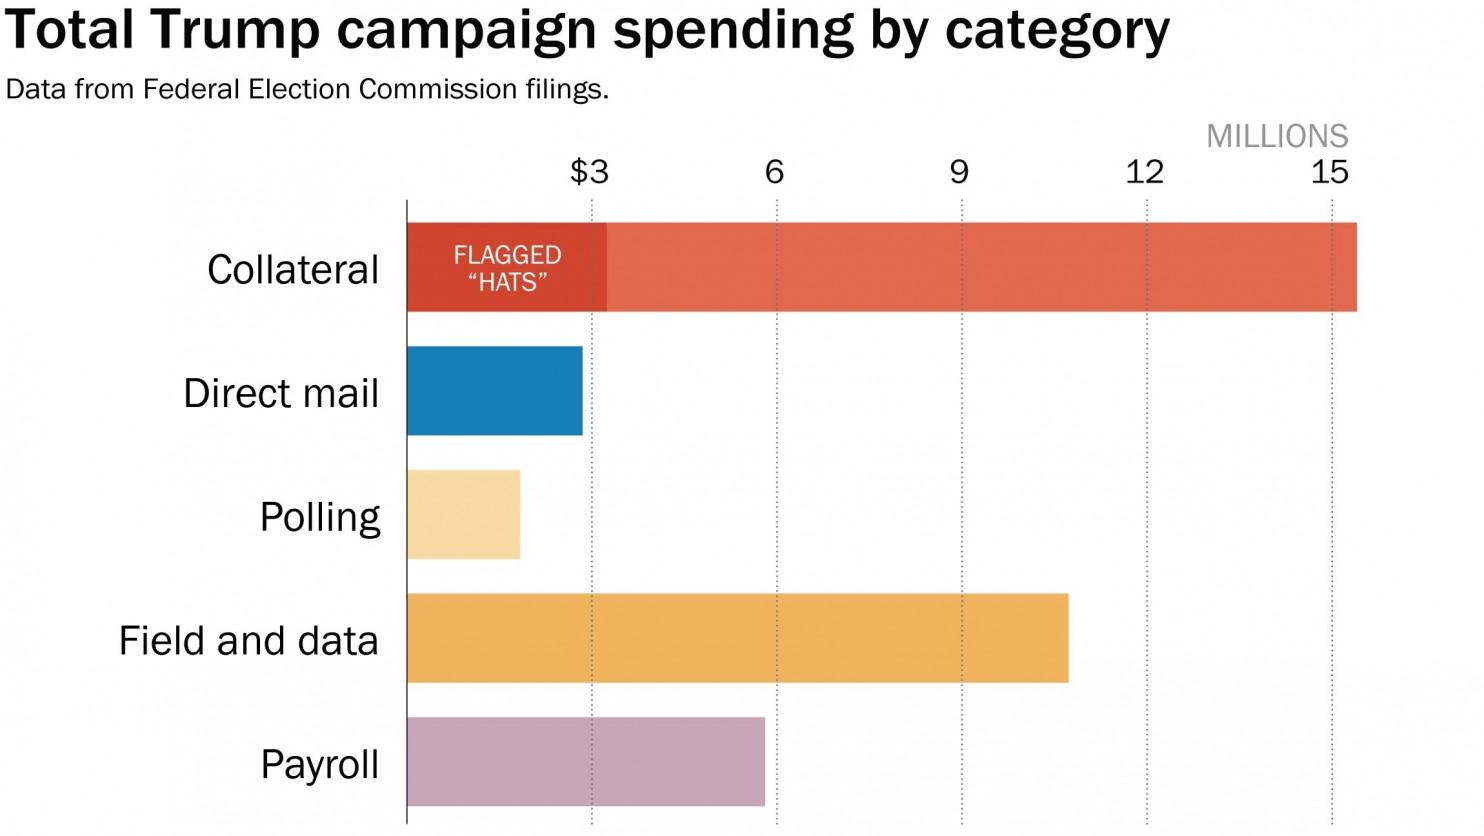 Donald Trump's campaign spent